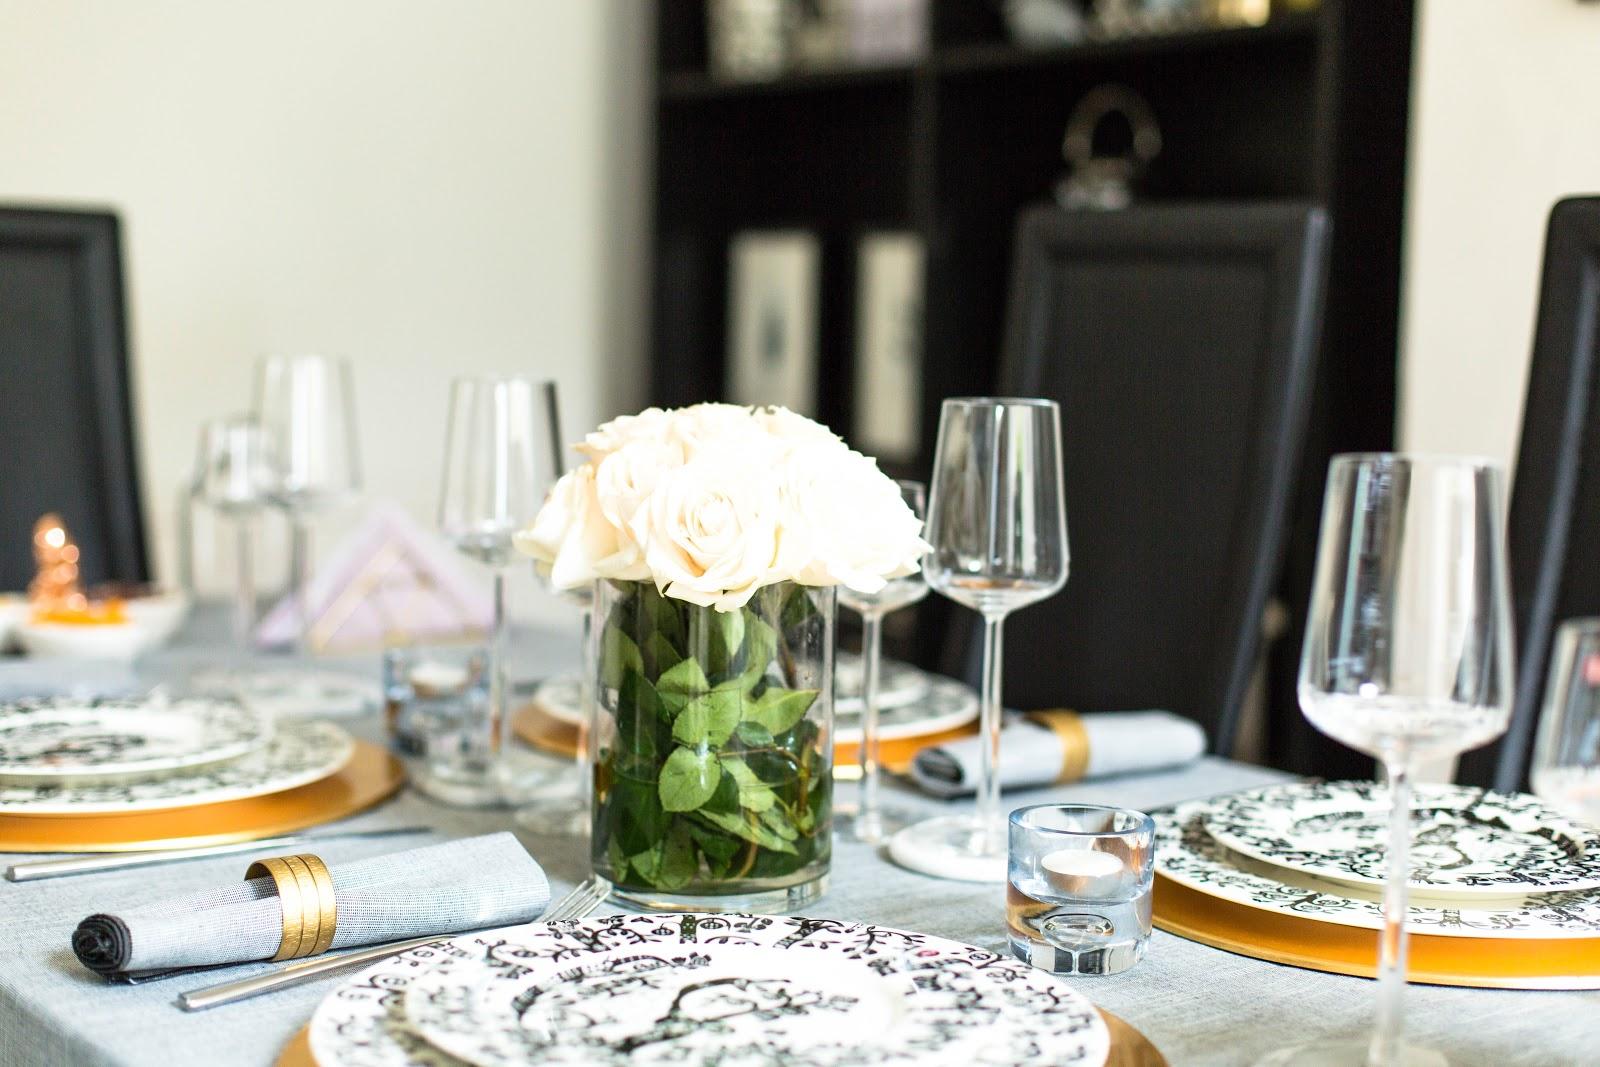 Autumn Dinner Party Ideas Part - 30: AUTUMN DINNER PARTY